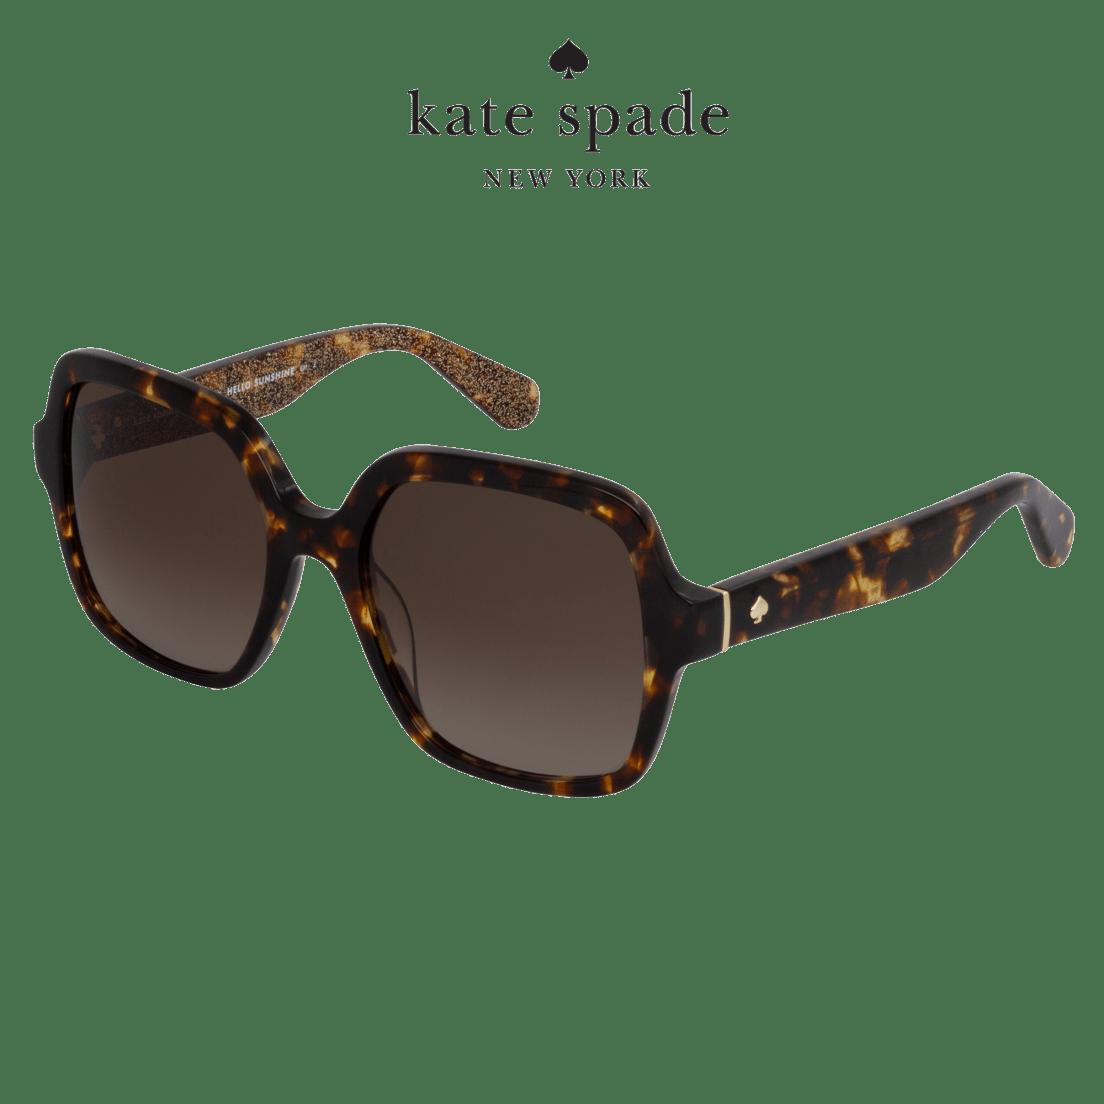 cf42abc06eec Kate Spade Katelee Sunglasses